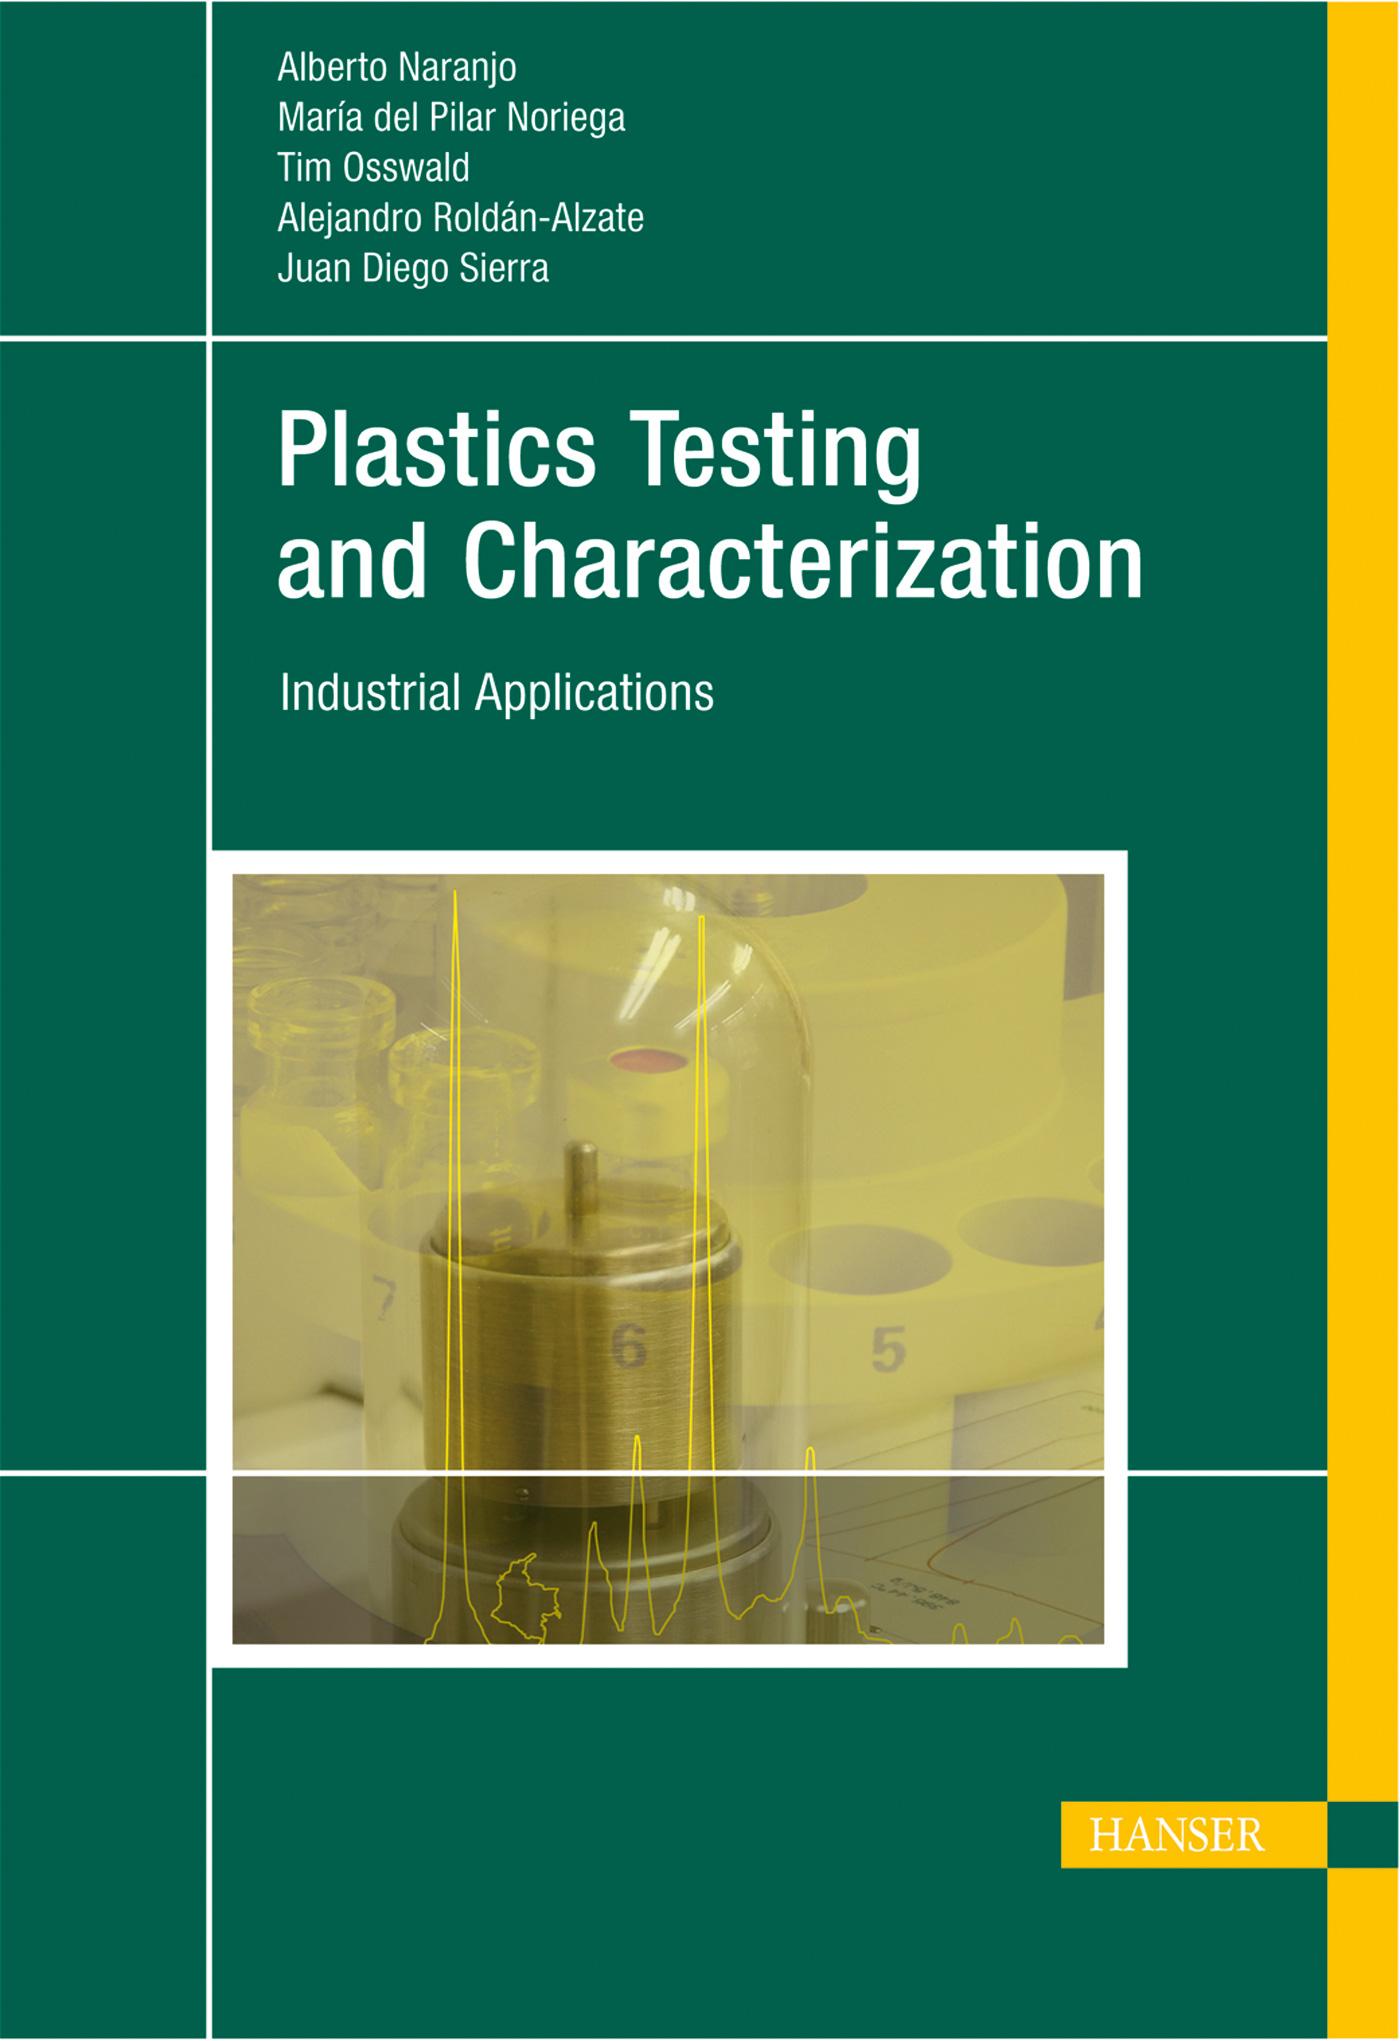 Naranjo C., Pilar Noriega E., Osswald, Rojan, Sierra M., Plastics Testing and Characterization, 978-3-446-41315-3